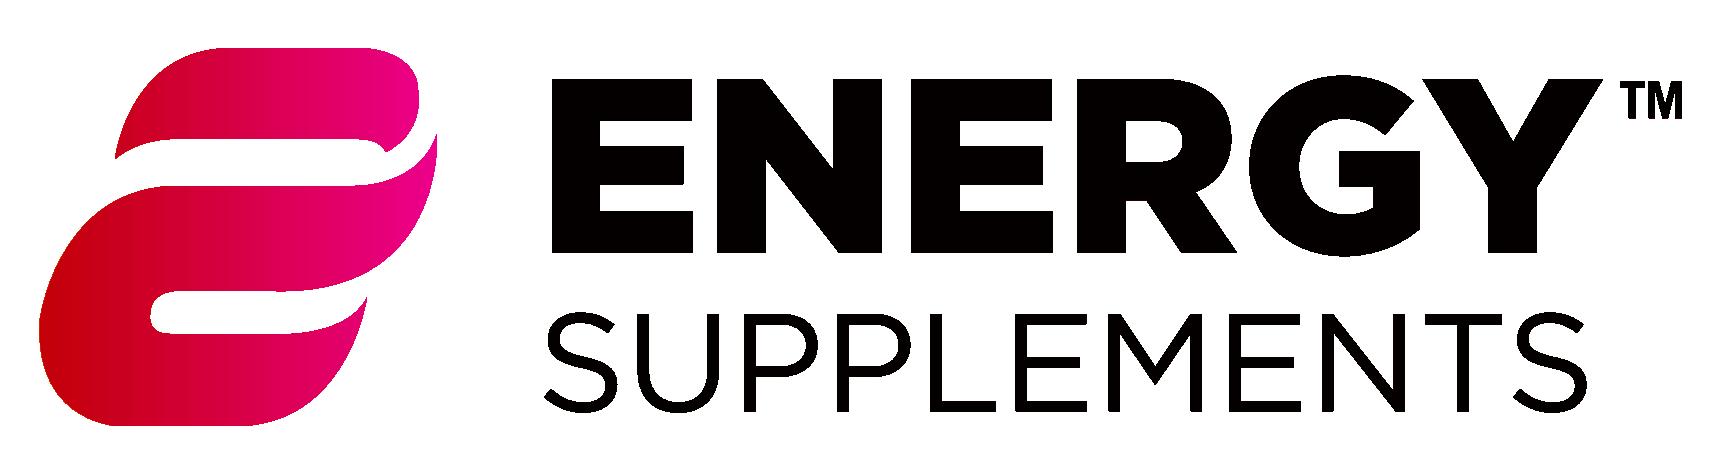 Energy Supplements logo